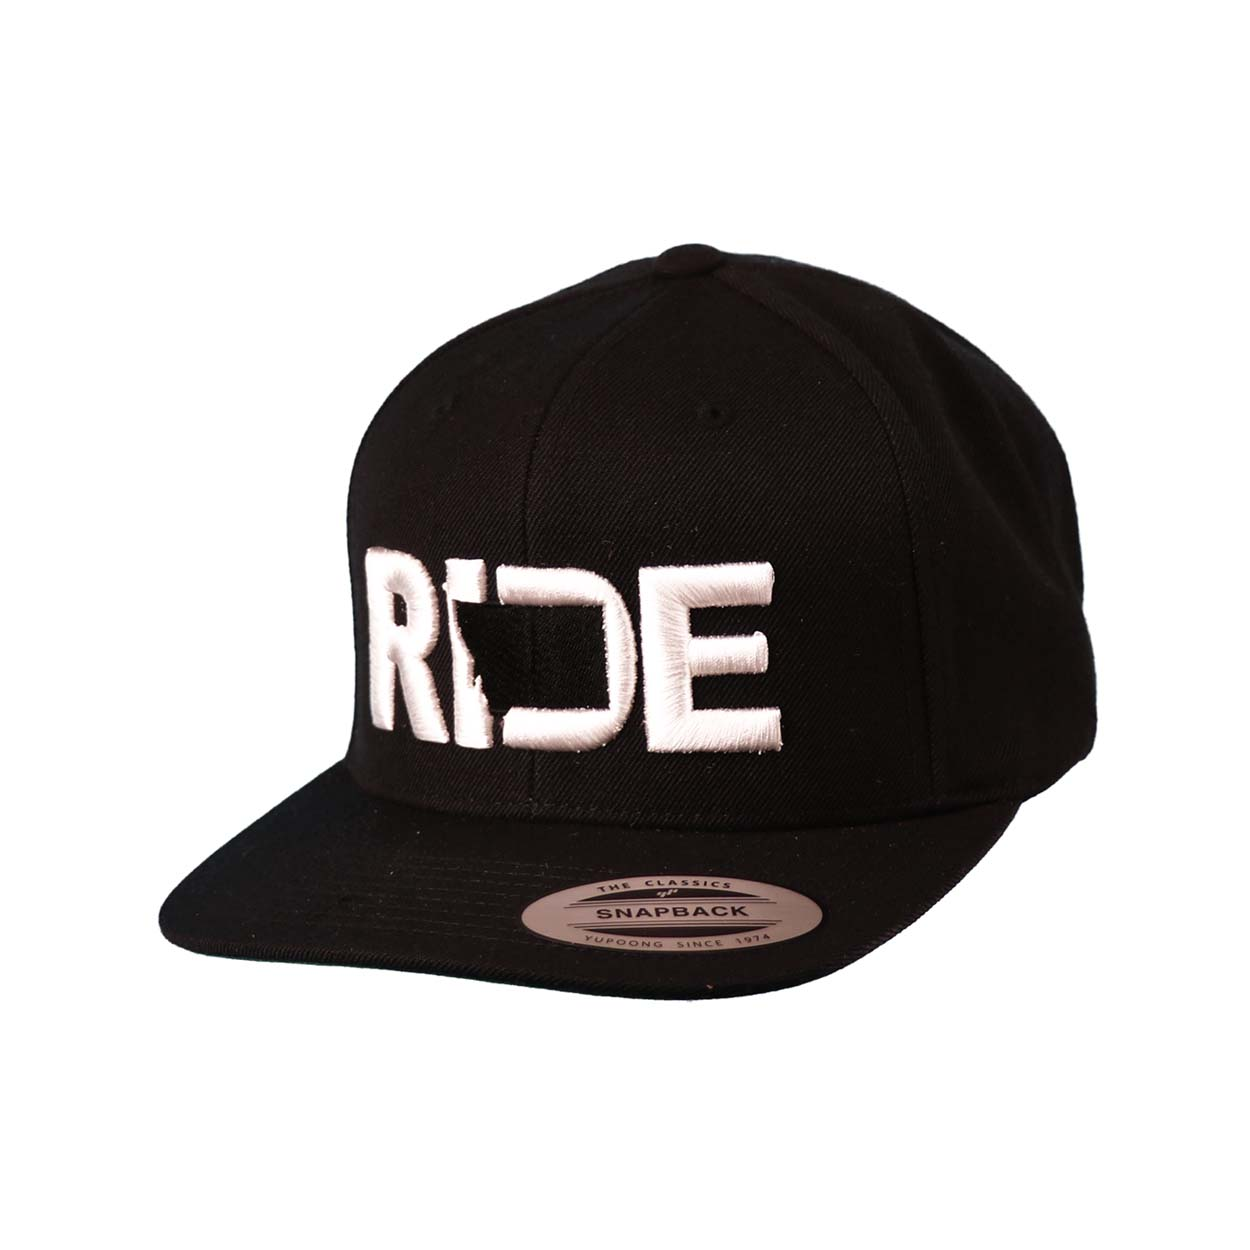 Ride Montana Classic Embroidered  Snapback Flat Brim Hat Black/White